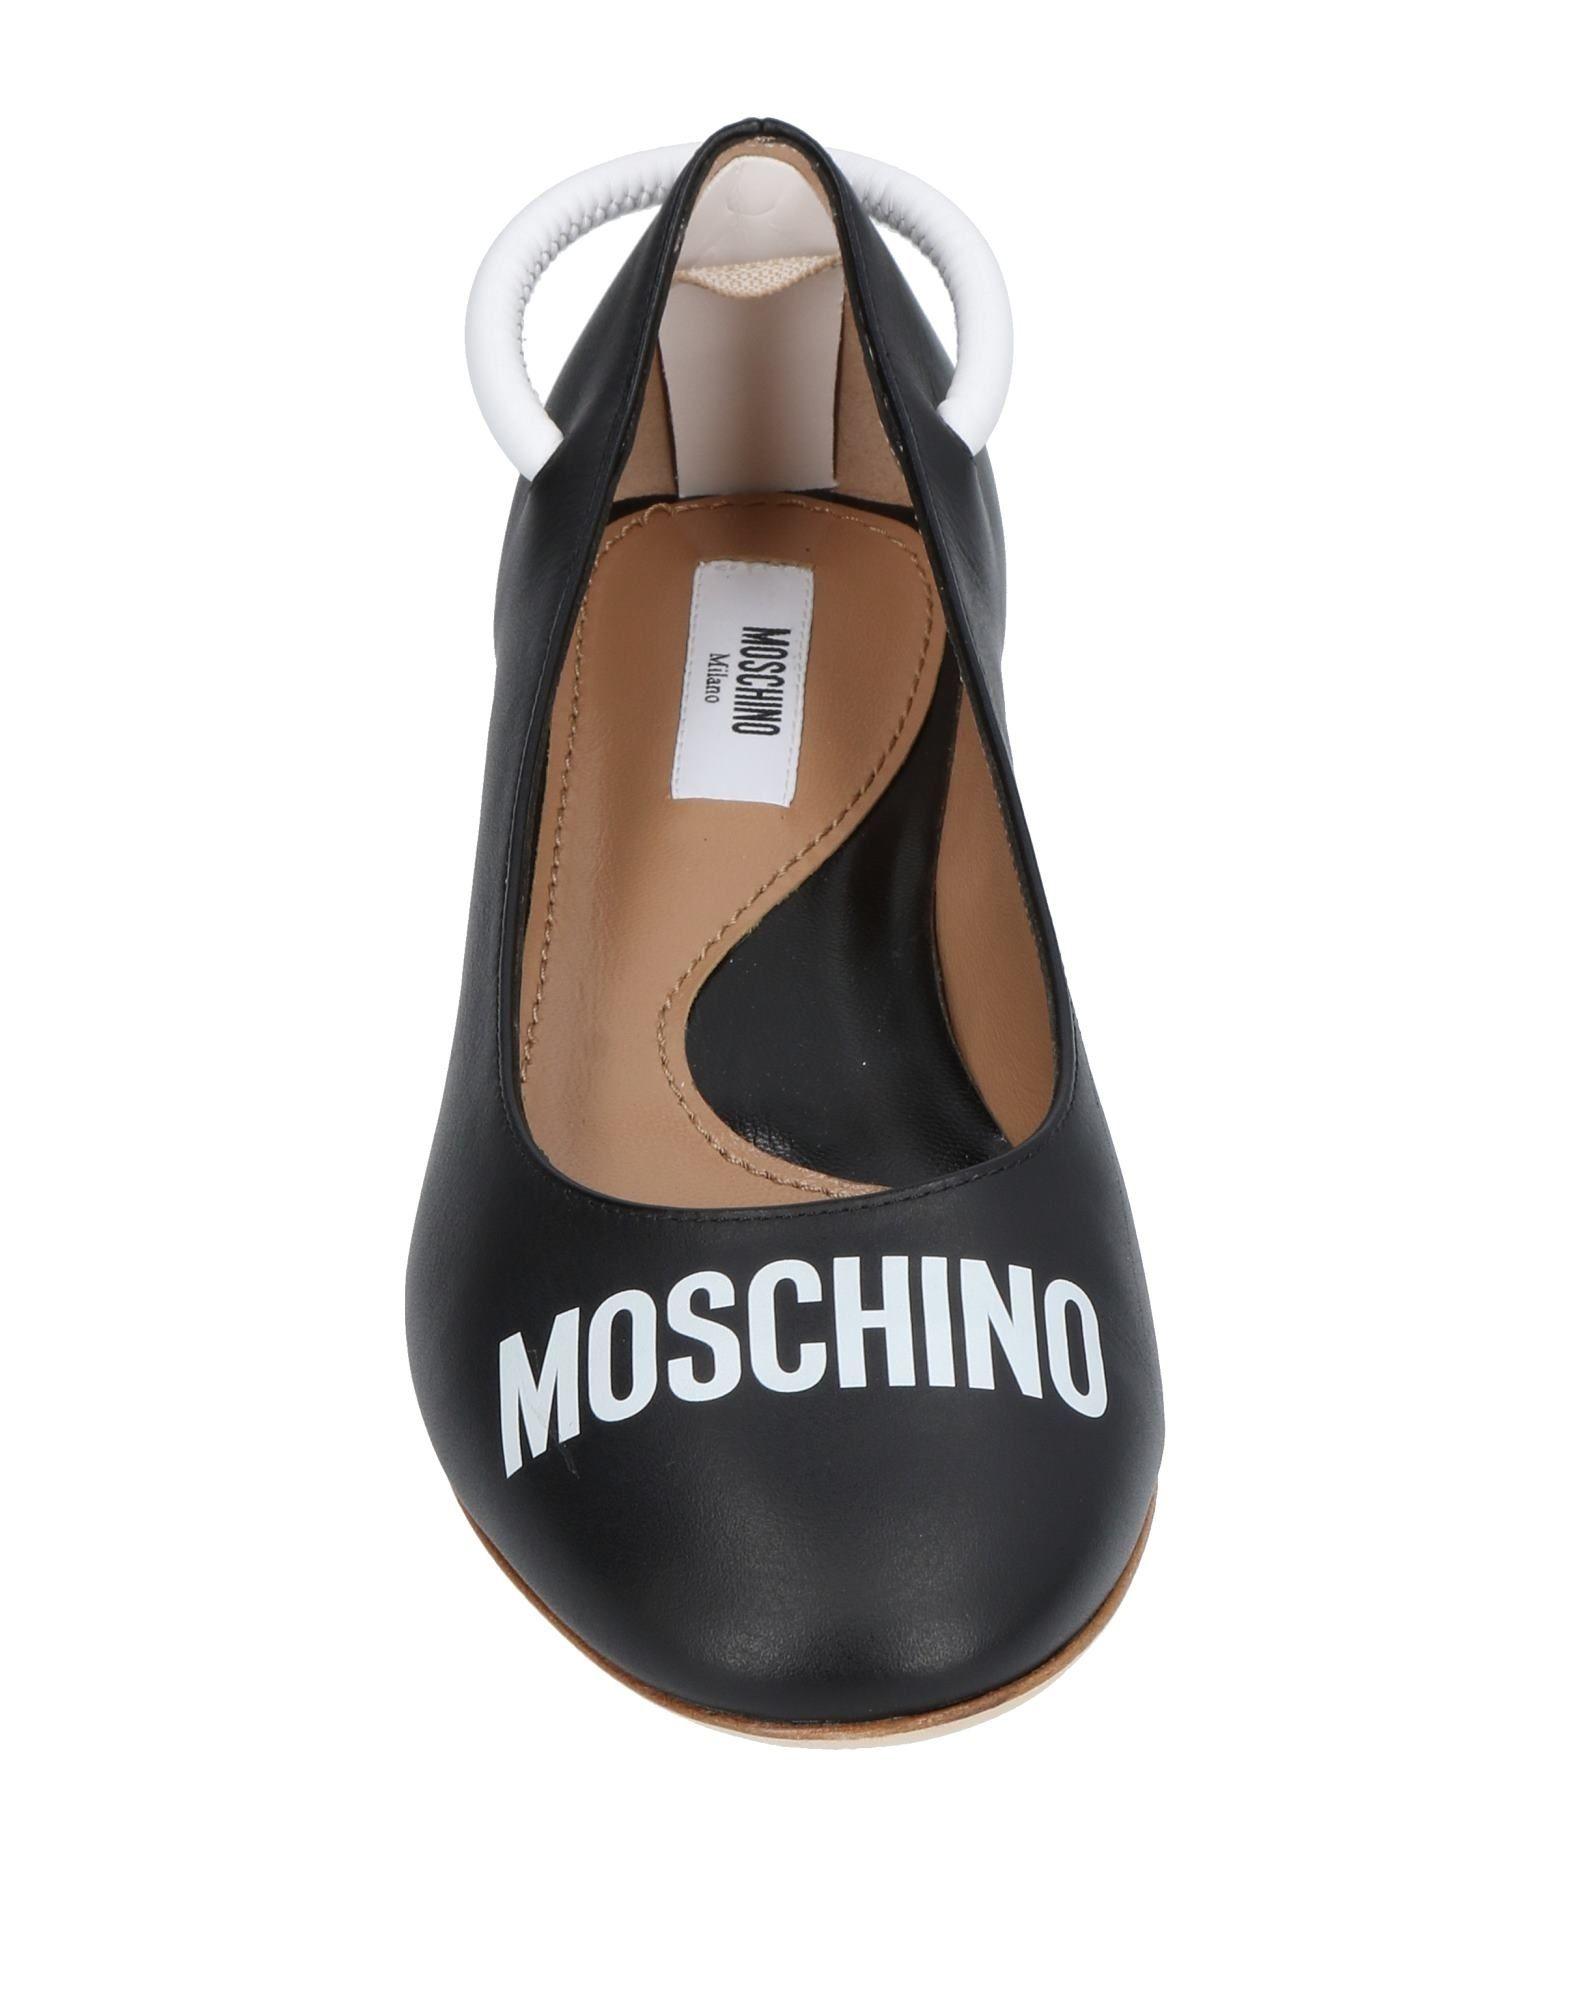 Rabatt Moschino Schuhe Moschino Rabatt Ballerinas Damen  11451124JG a82383